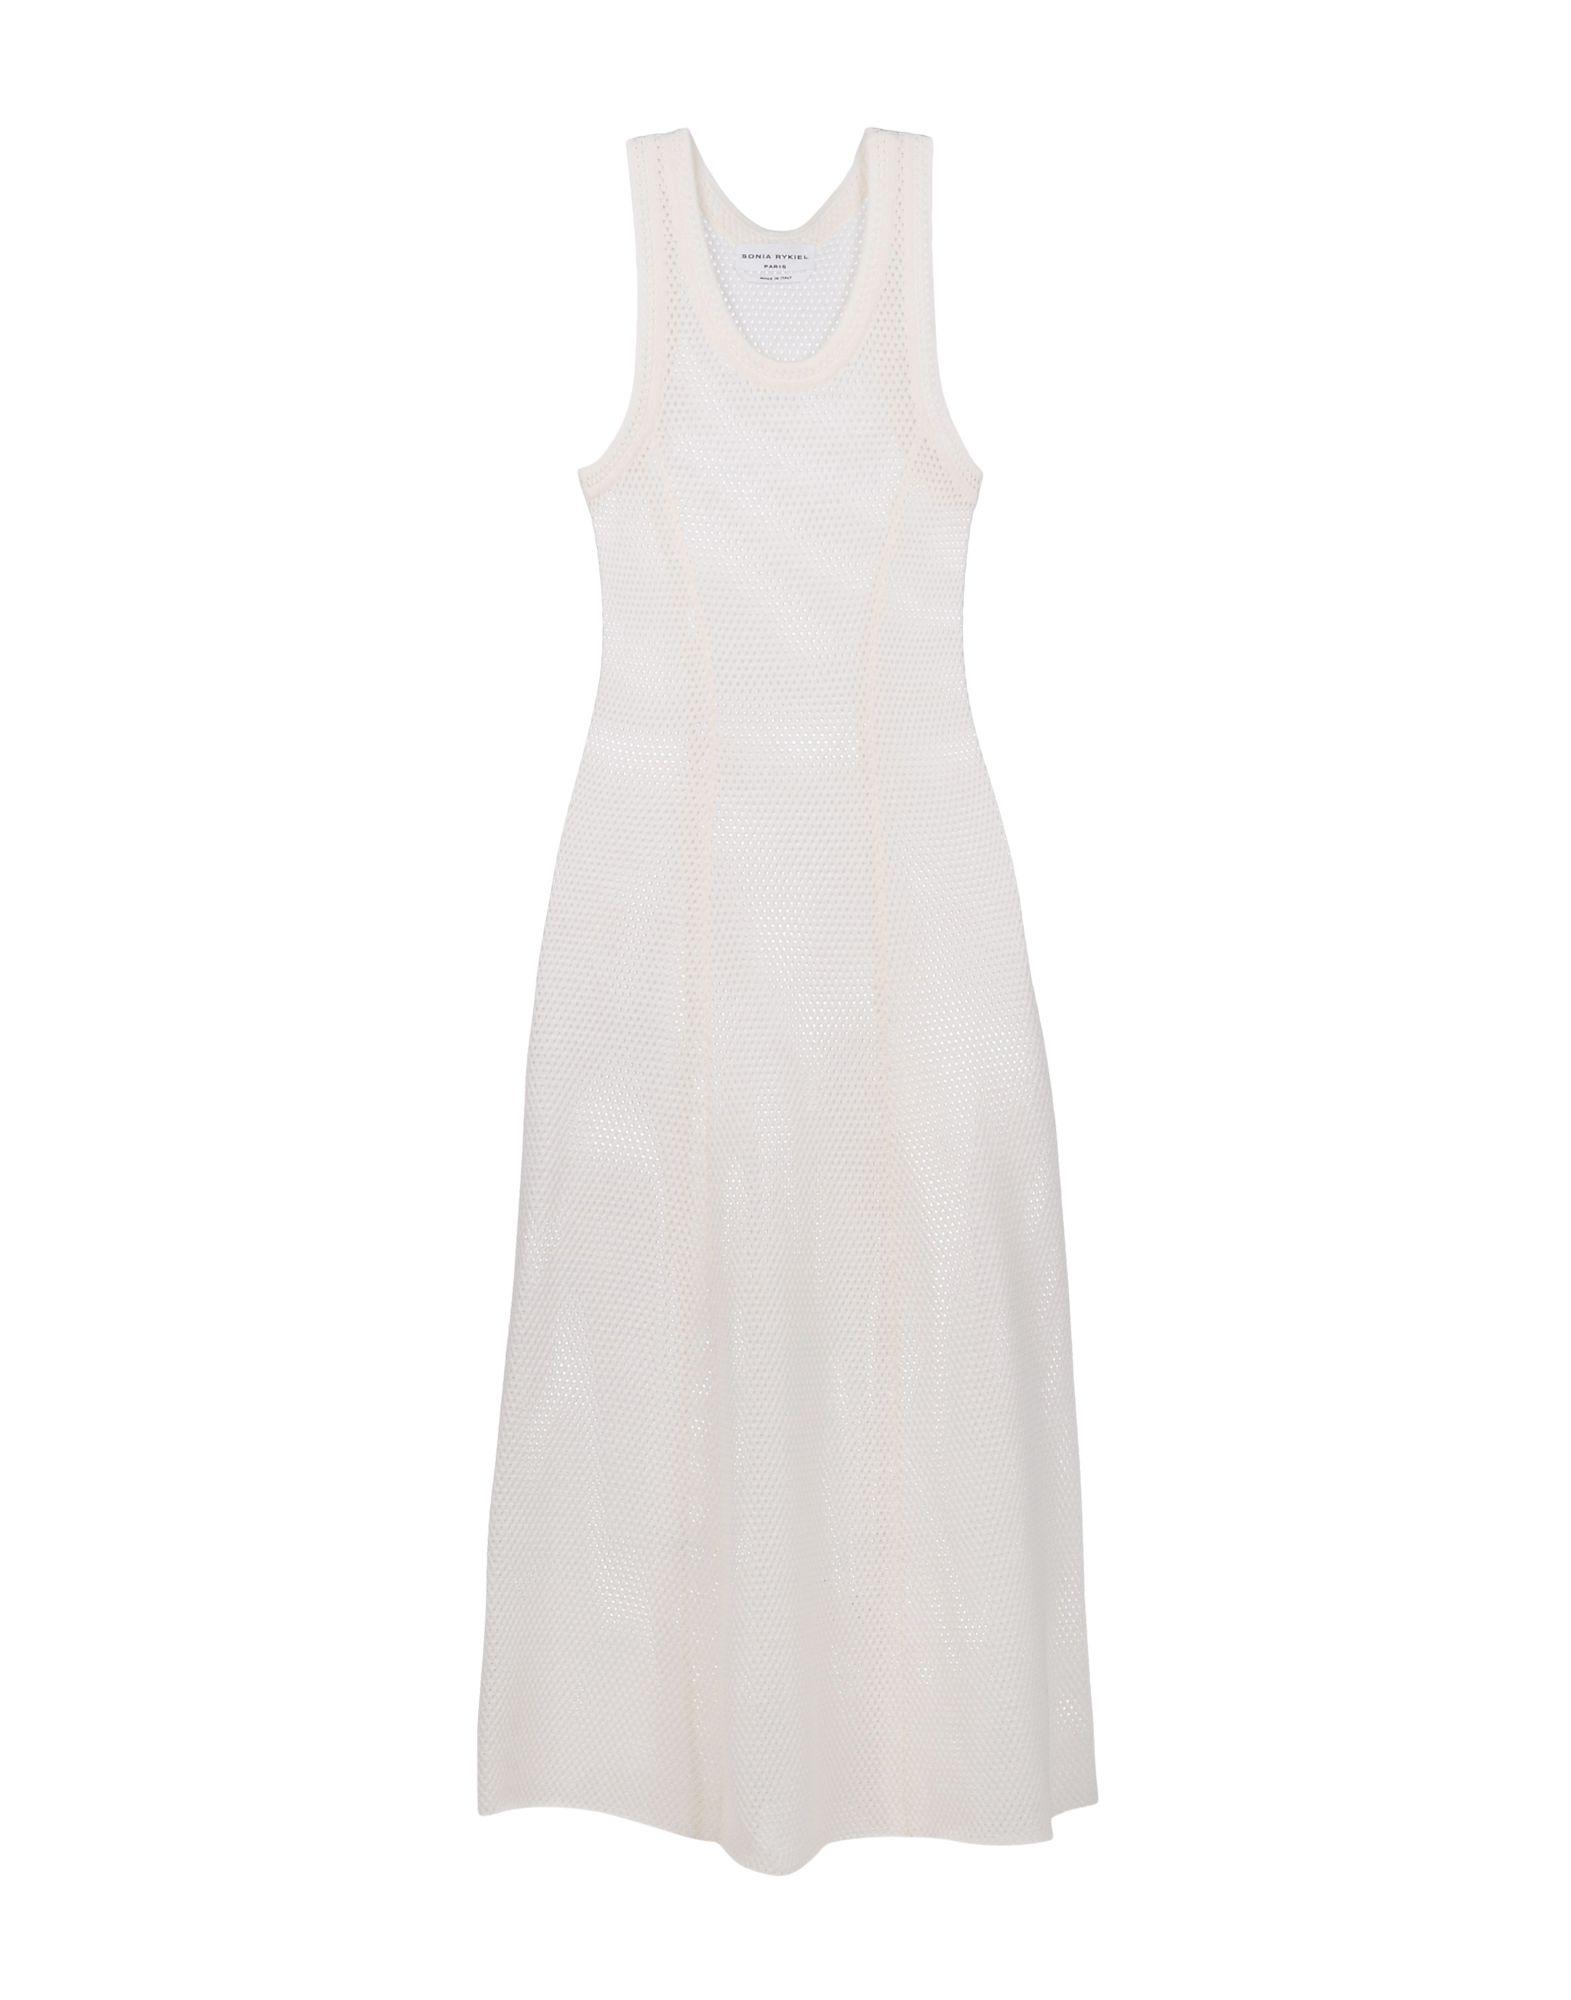 SONIA RYKIEL Платье длиной 3/4 lisa corti платье длиной 3 4